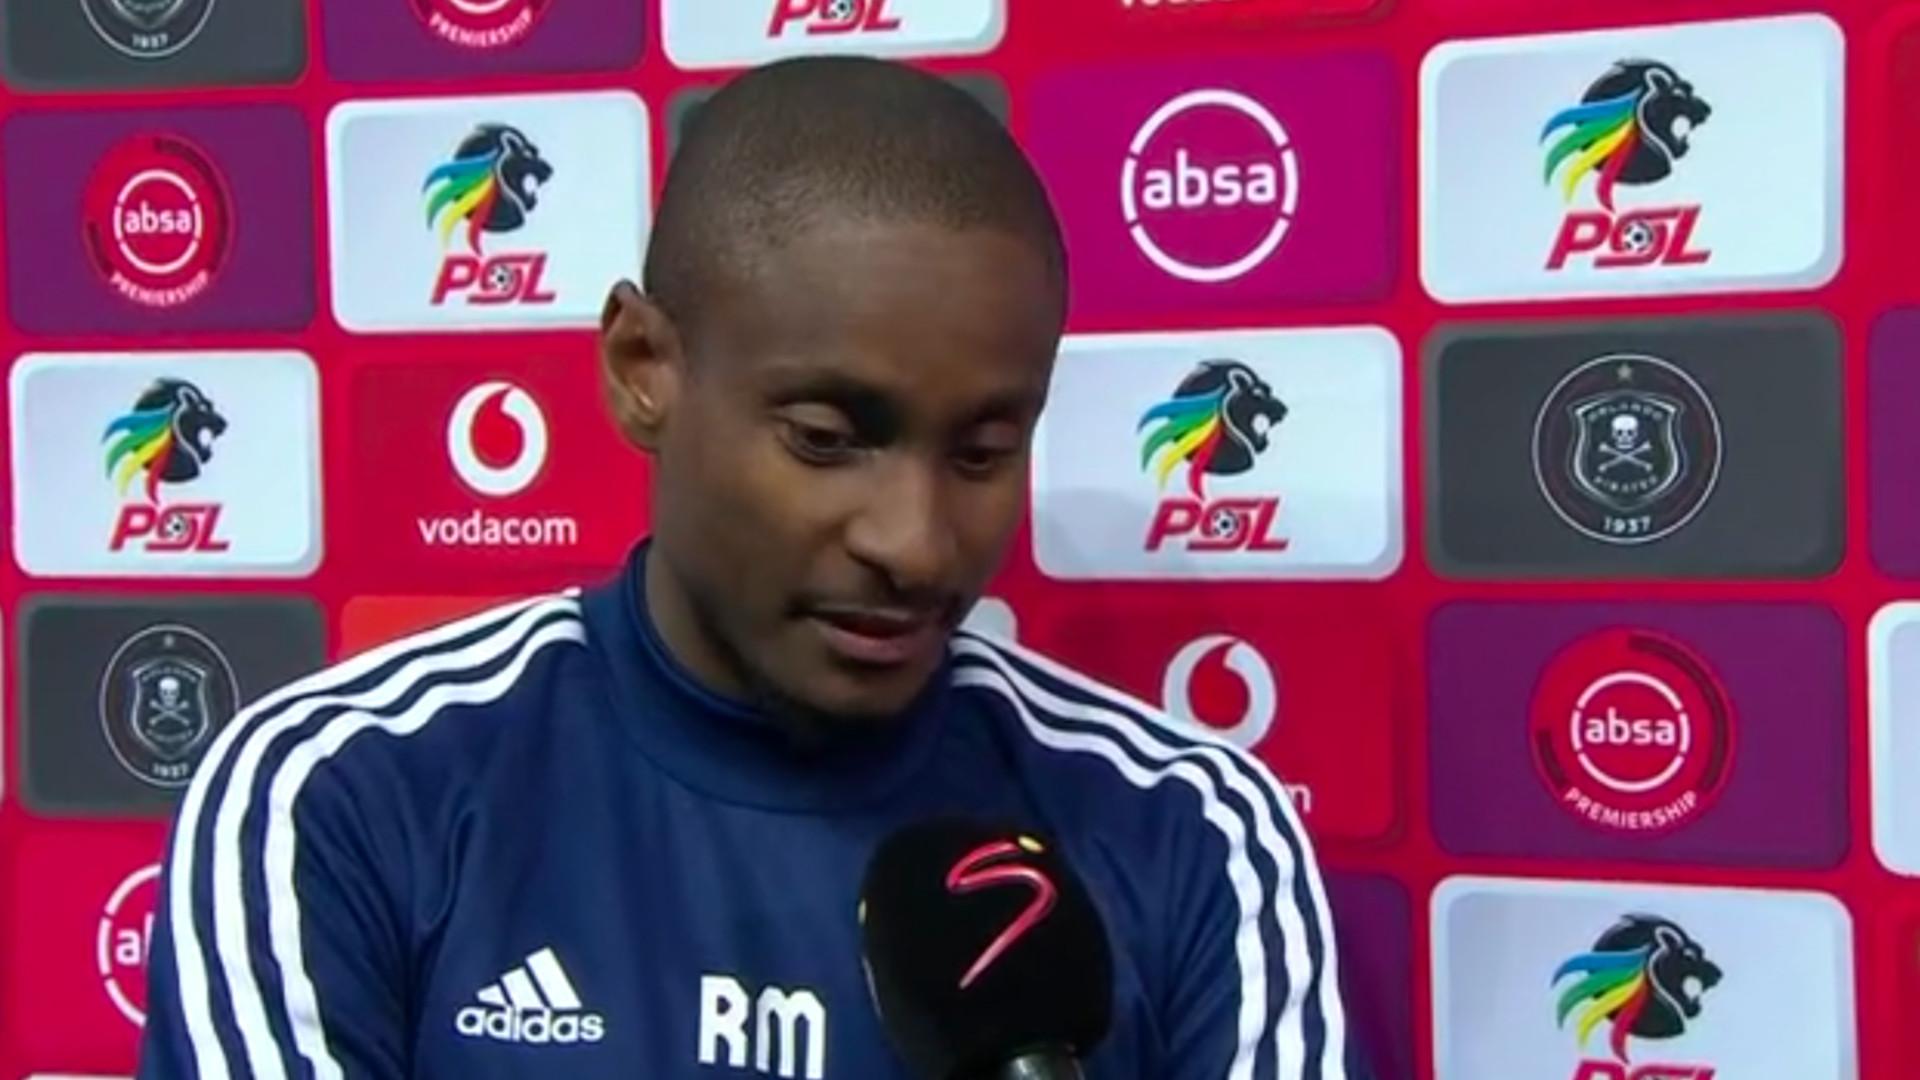 Absa Premiership 2019/20 | Pirates v Arrows | Rhulani Mokwena | Interview